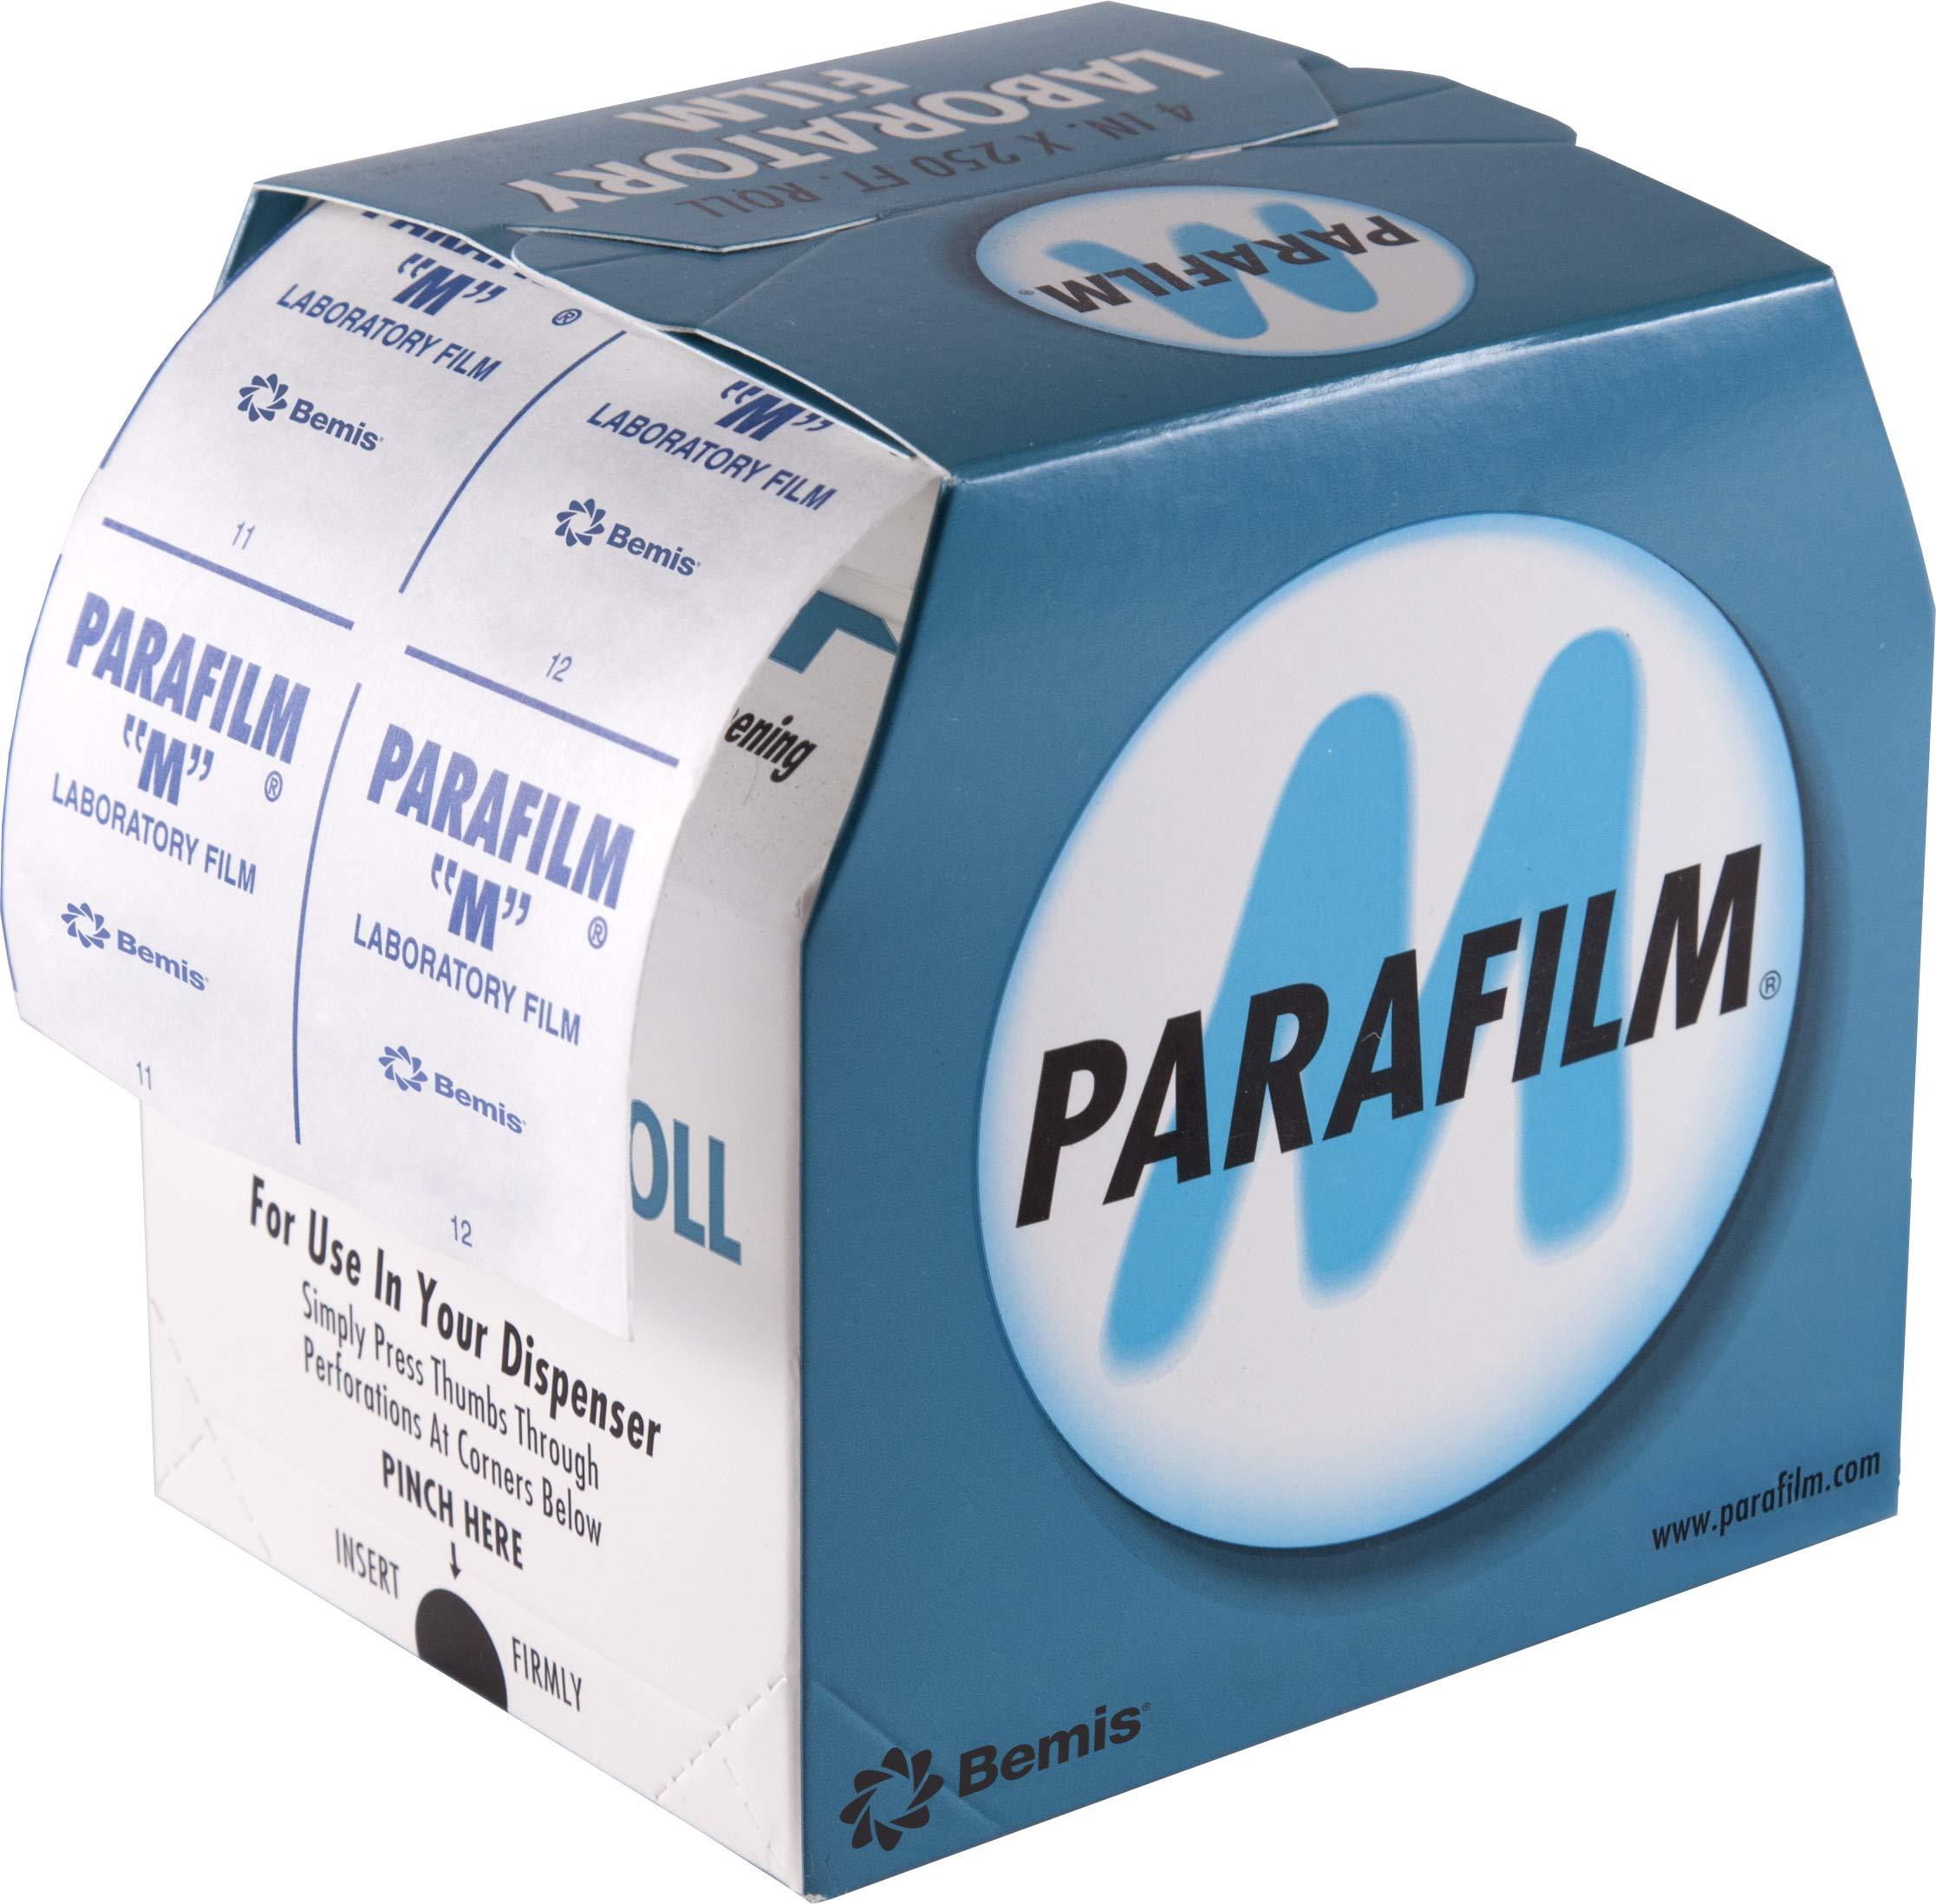 Heathrow Scientific HD234526C Parafilm Moisture Proof Sealing Film, 135mm Width x 107mm Height x 132mm Depth